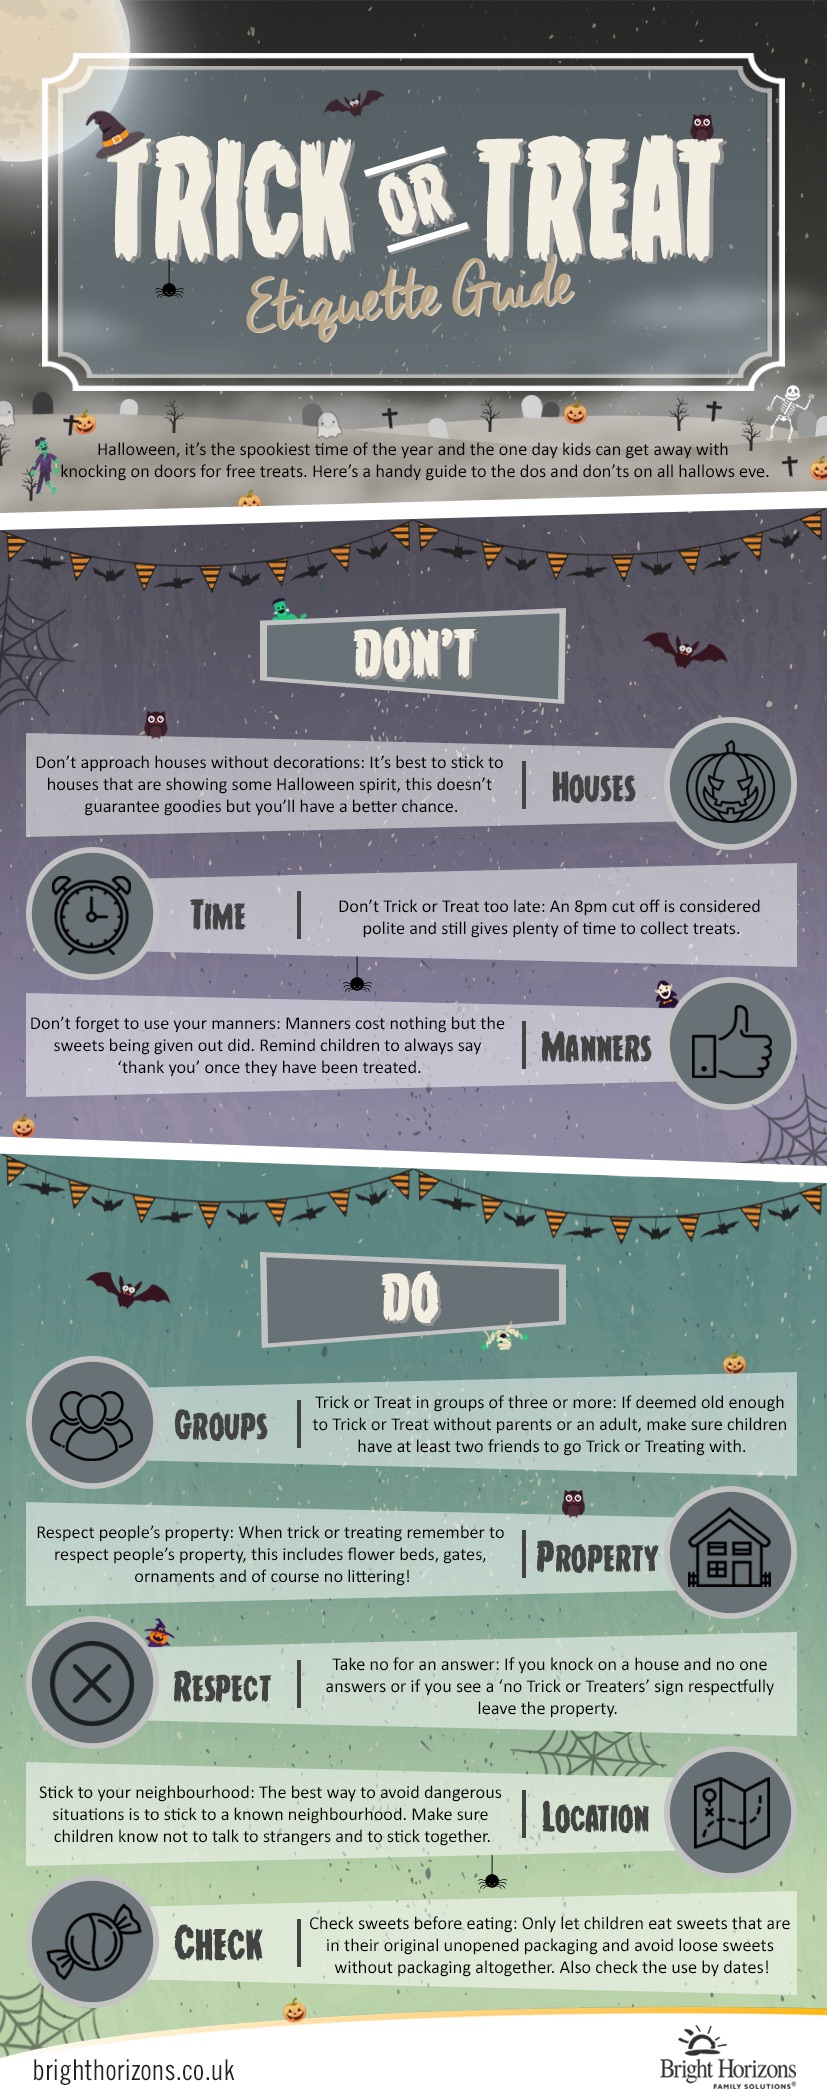 Trick or Treat Etiquette Guide